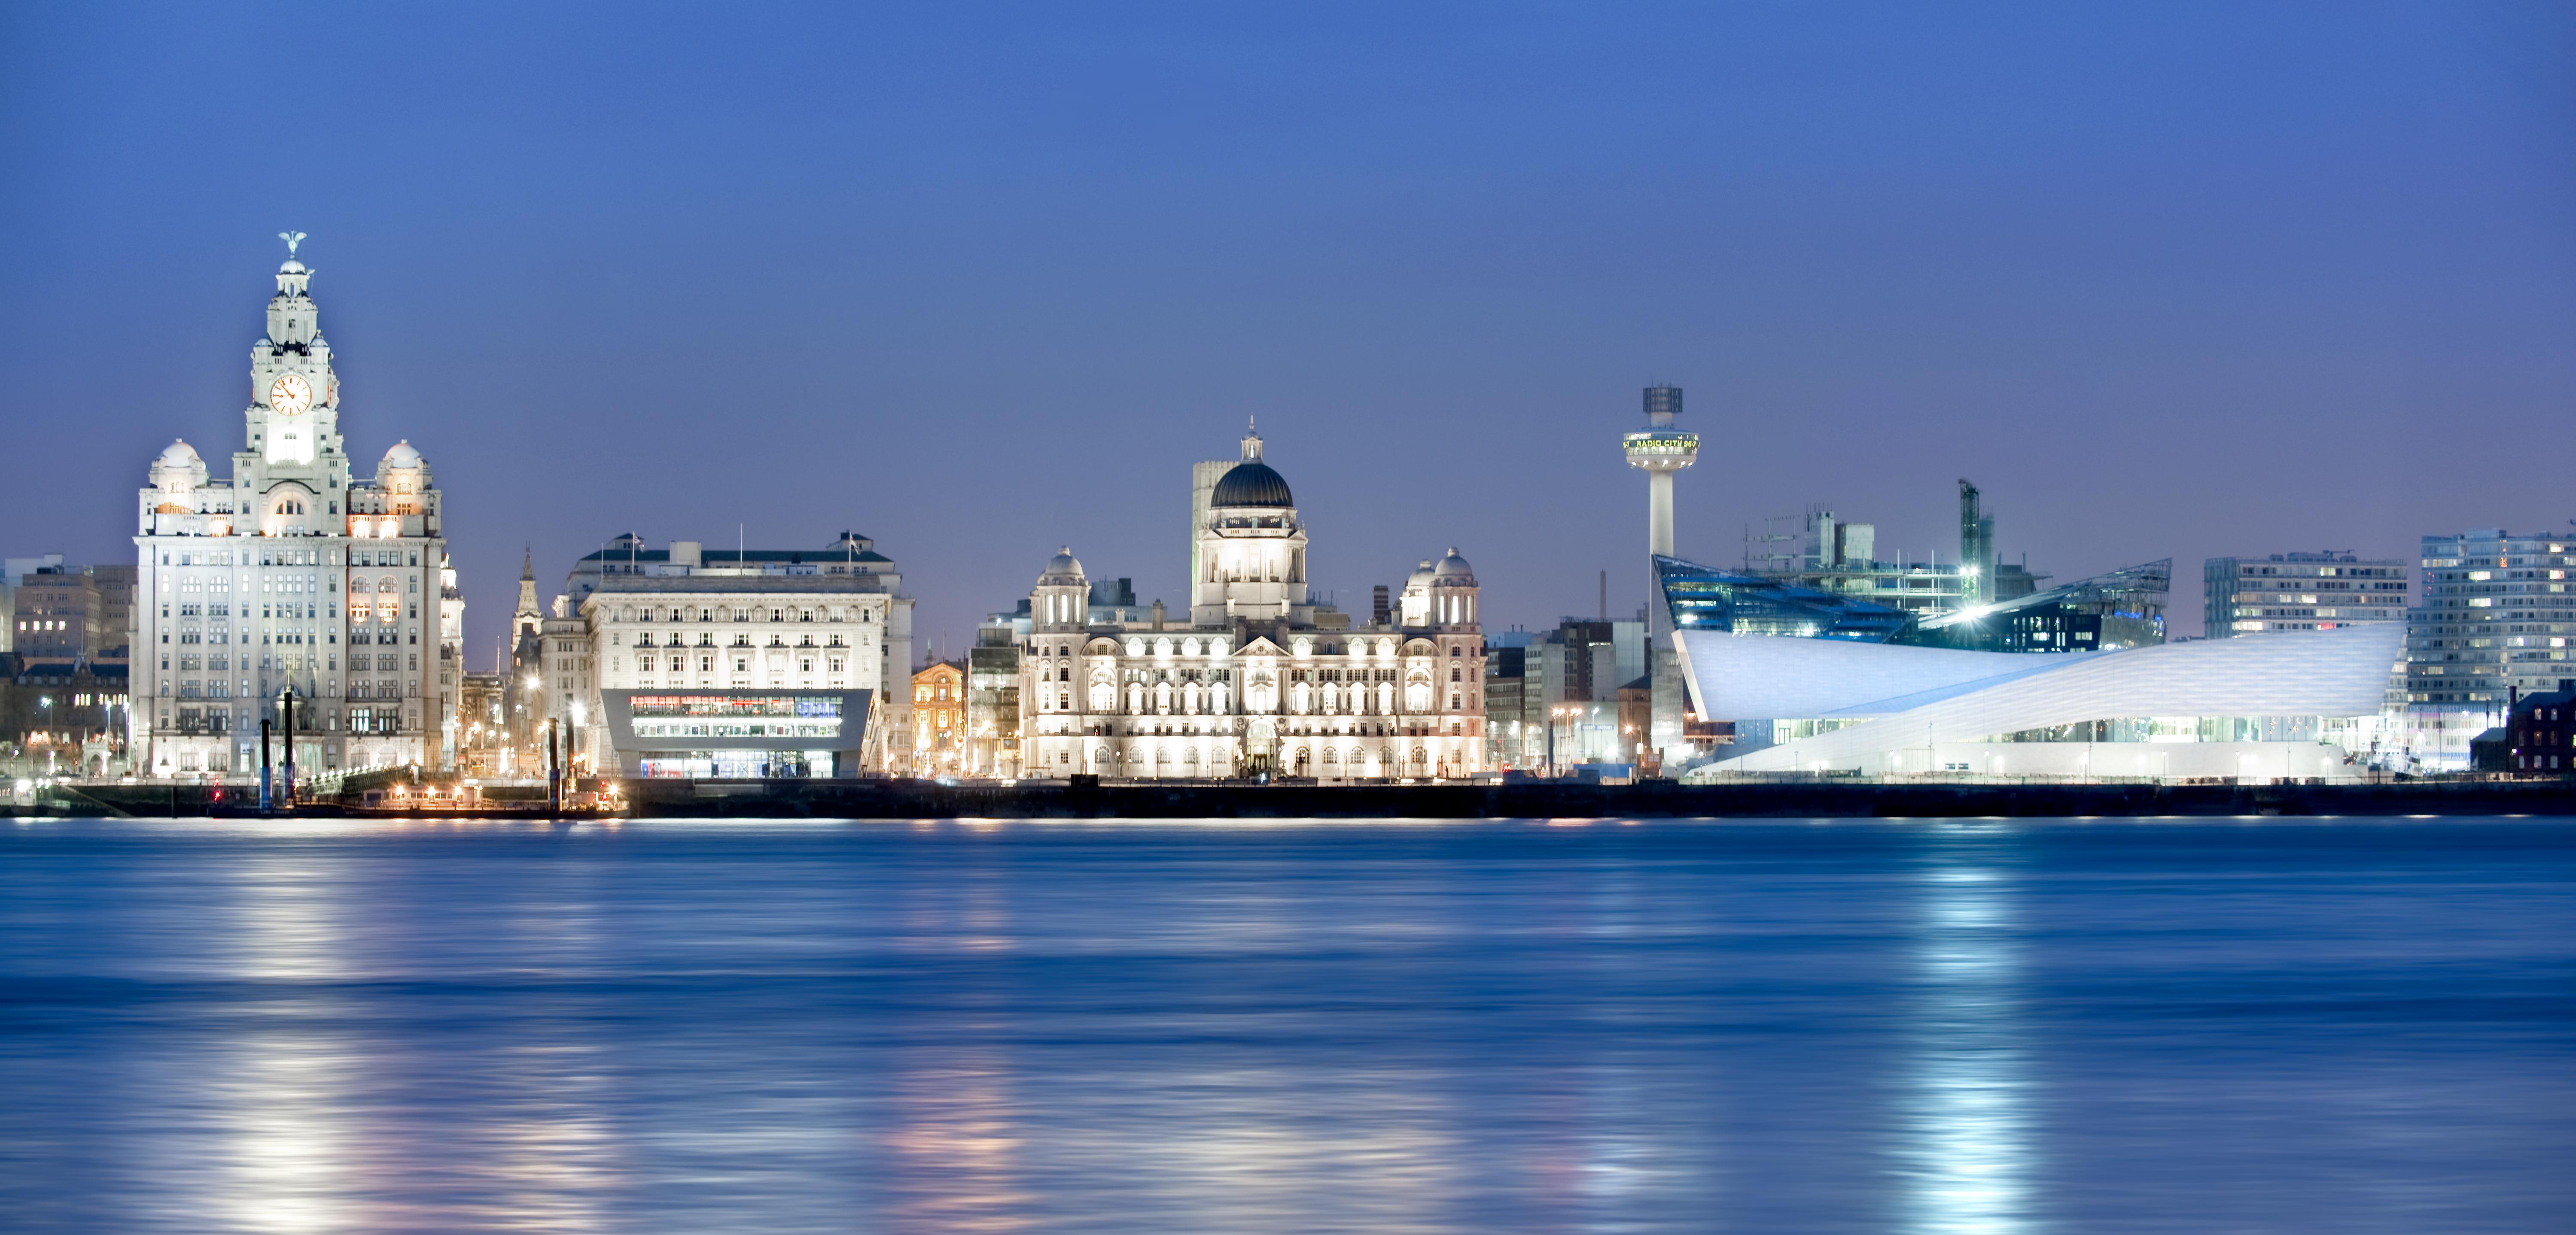 Liverpool Waterfront - Night (credit Craig Easton) - Copy